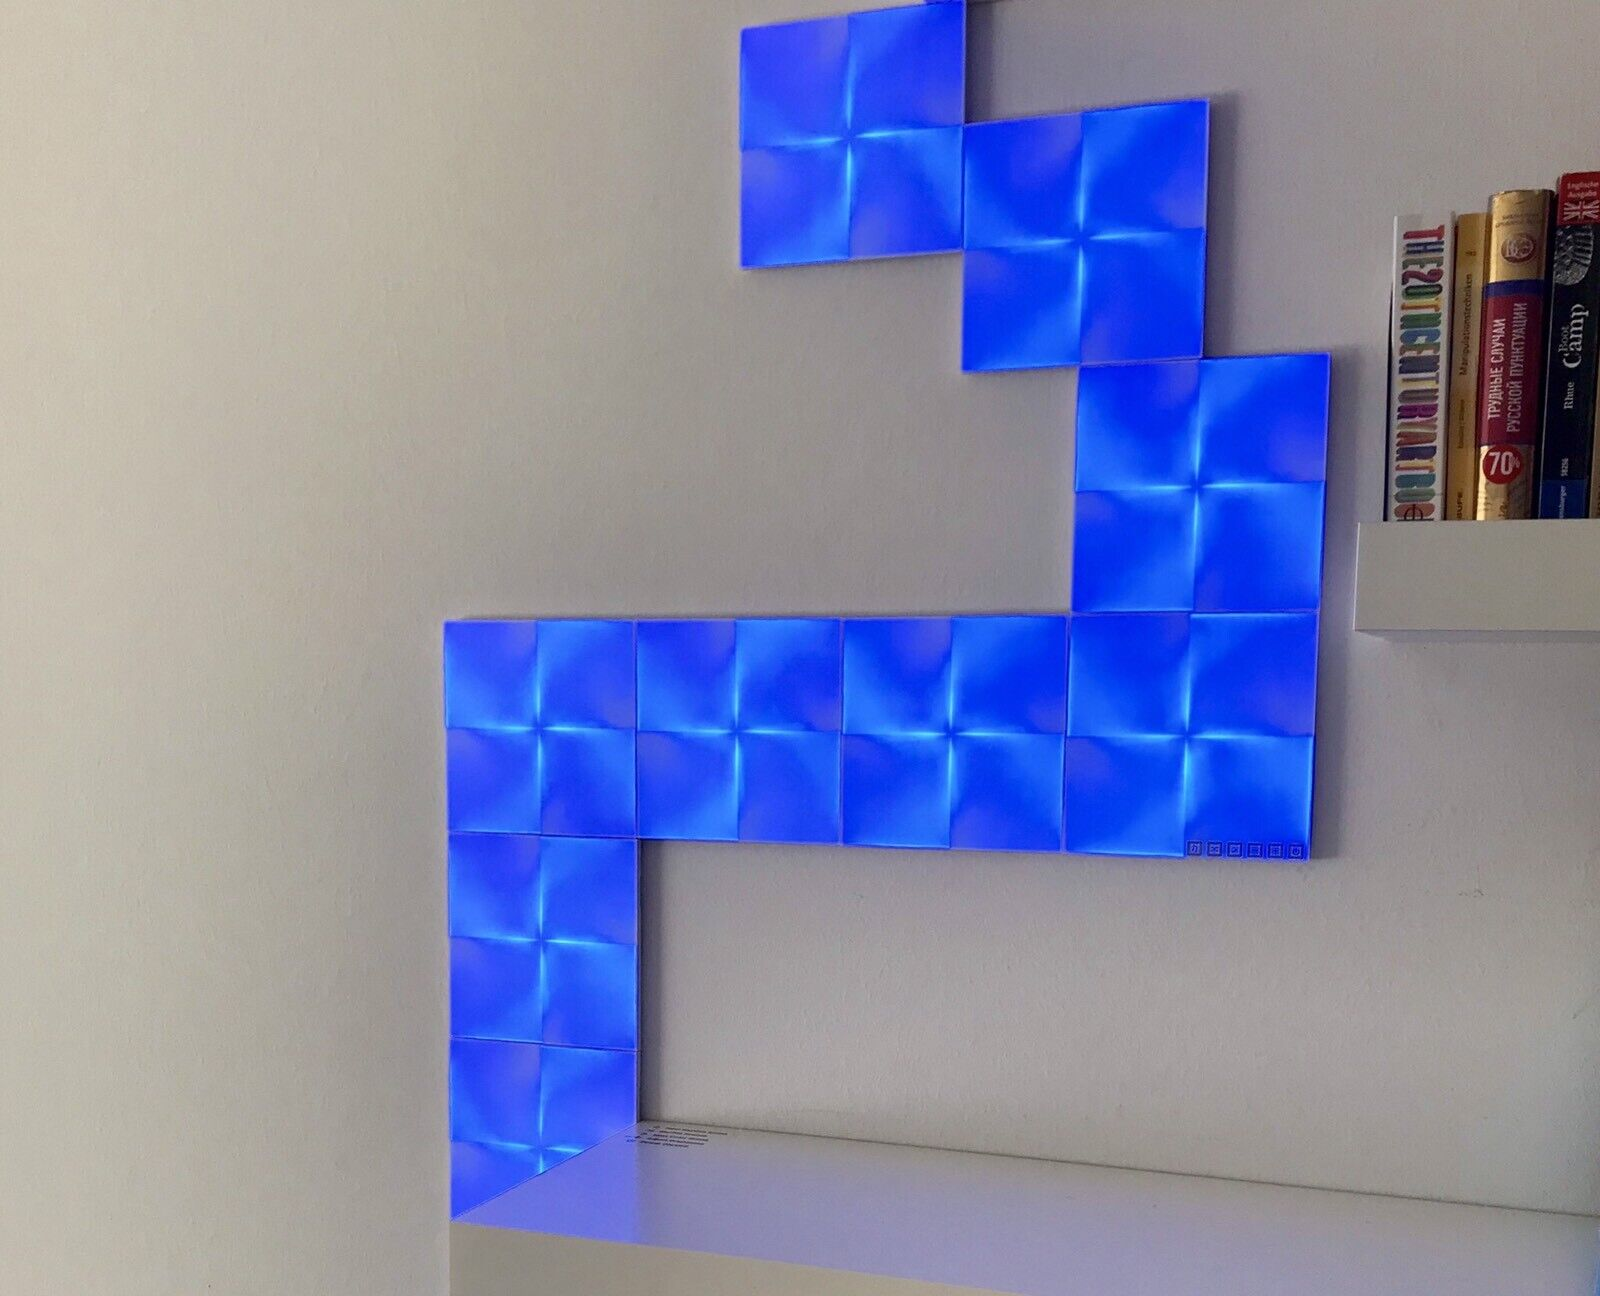 NANOLEAF Canvas Smarter Kit 9 panels panels panels NL29-0002SW-9PK , Montage ohne bohren be7d4b